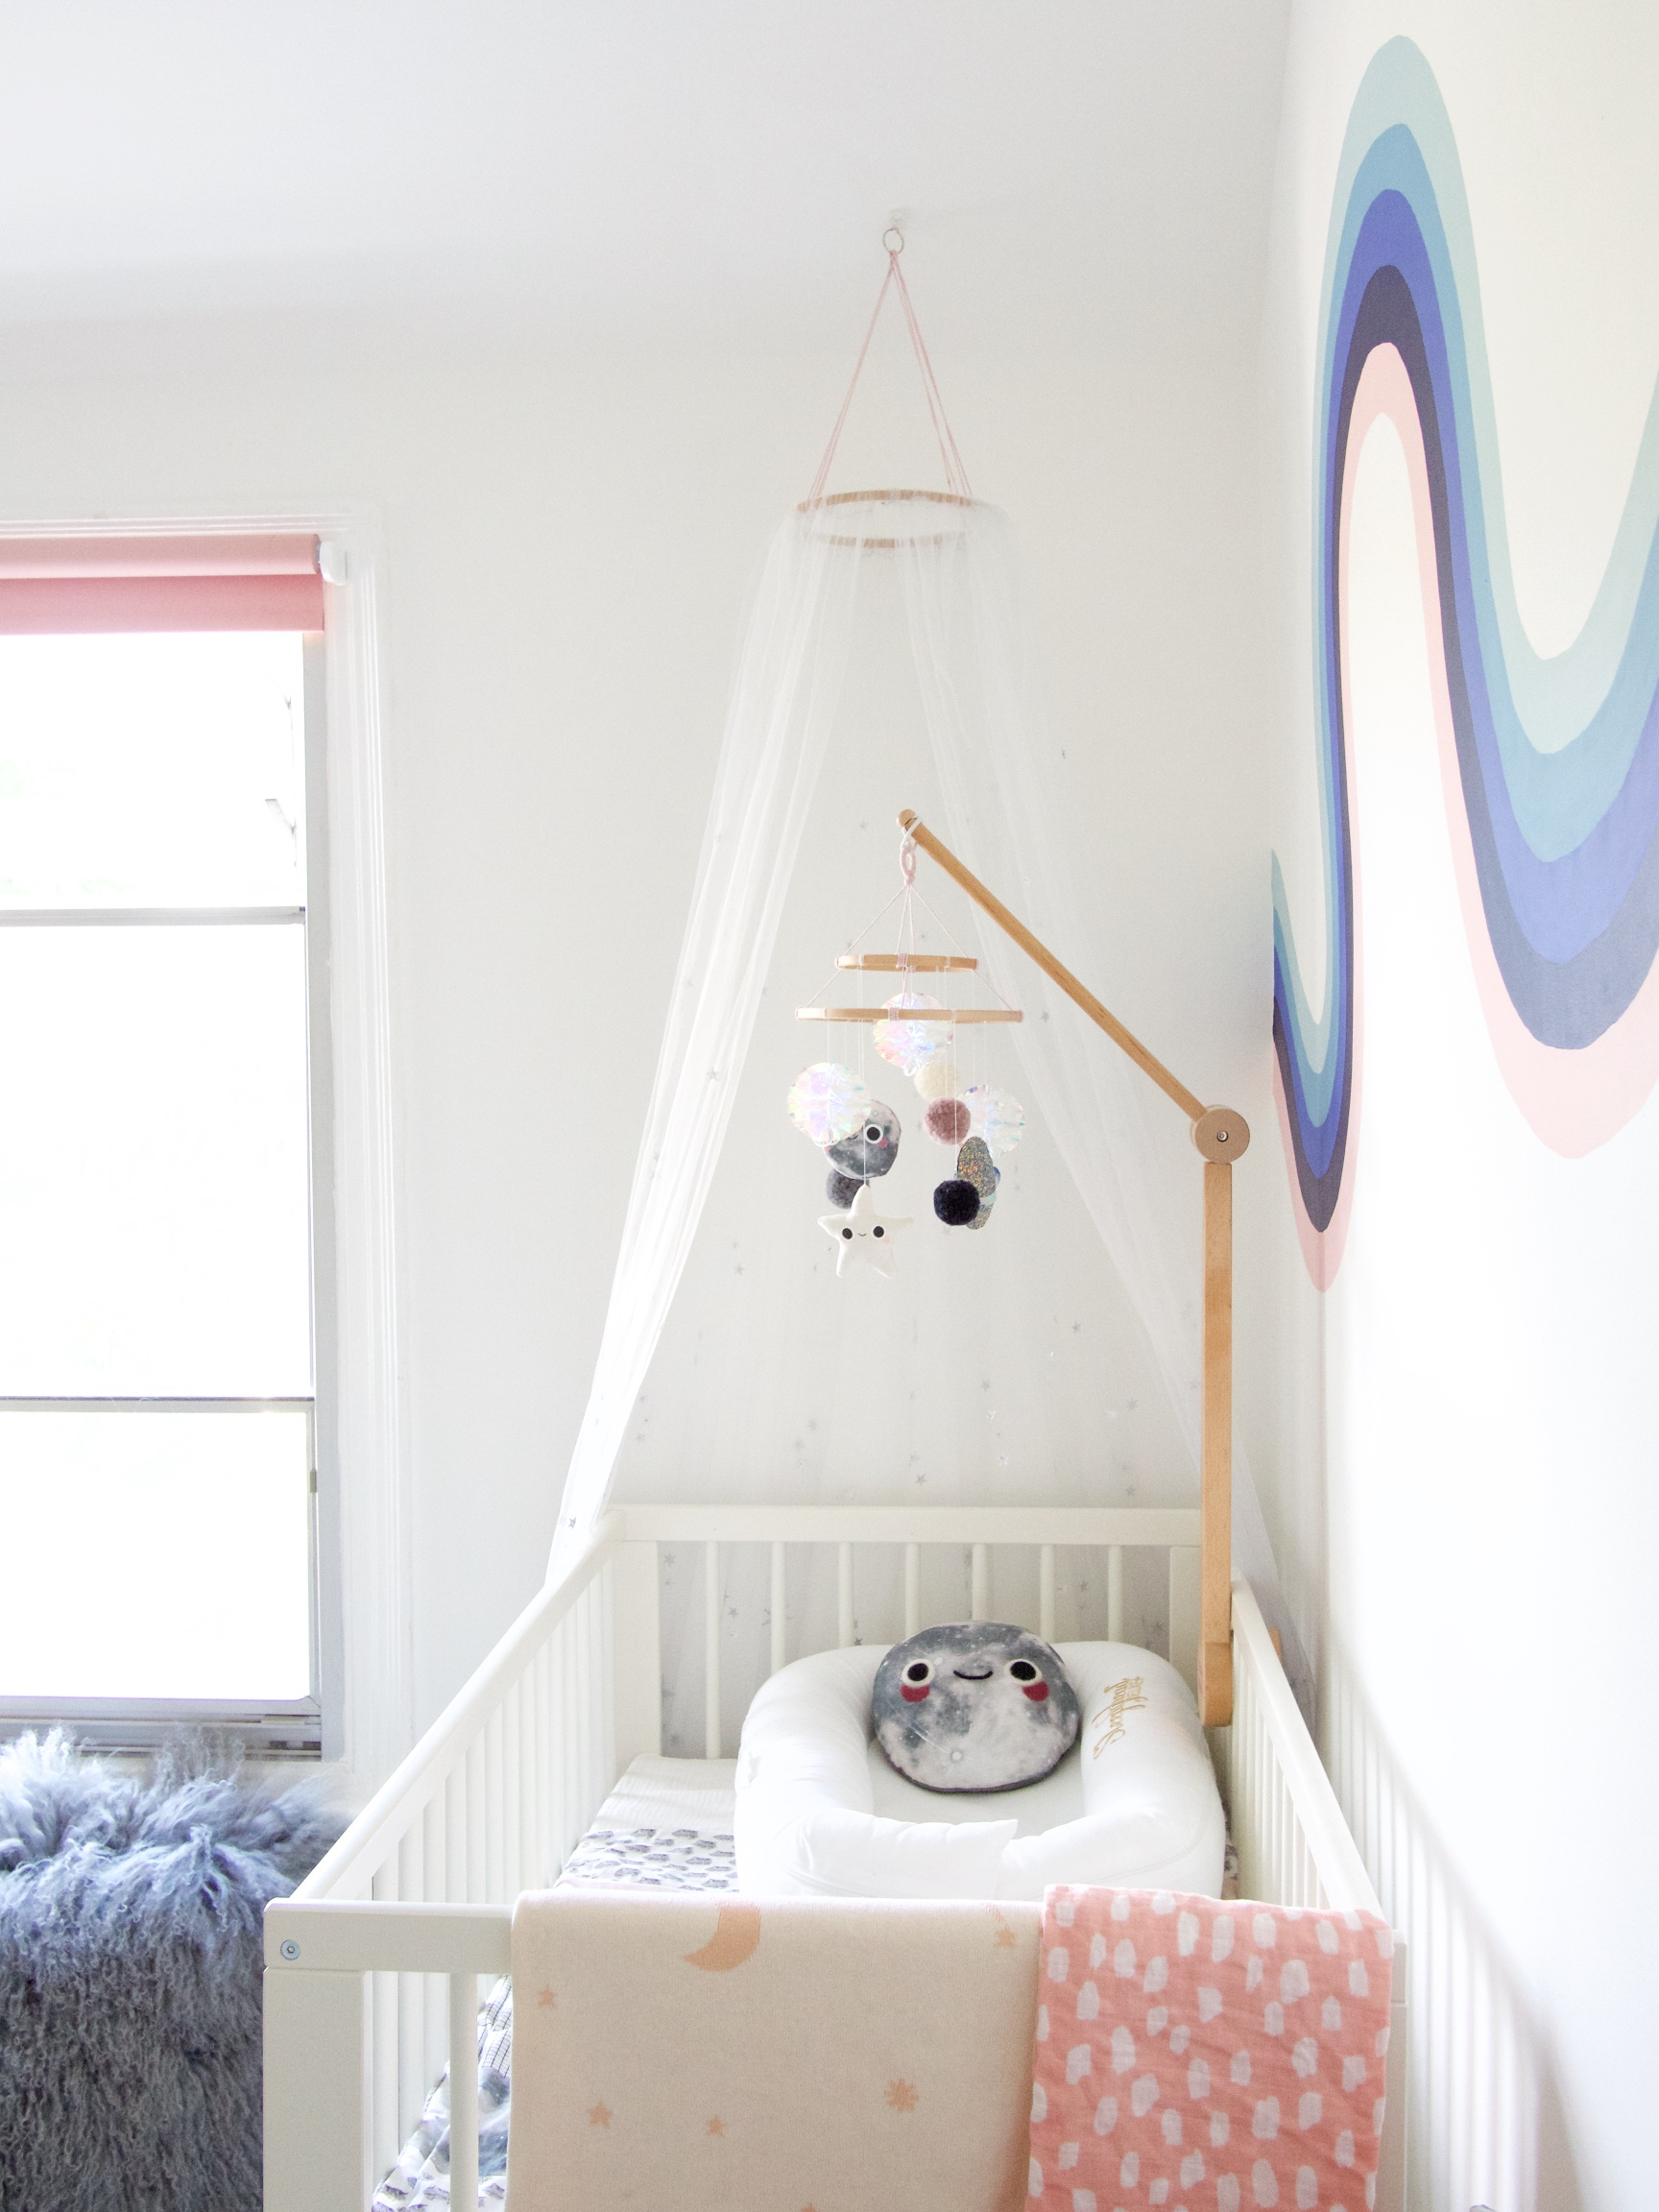 The Details: cot {old IKEA gulliver}; mobile {homemade};  mobile holder ; crib net {homemade from my  Crown & Glory wedding veil };  sleepyhead *; moon pillow {homemade}; fluffy cushion *;  moon & stars blanket ;  blush swaddle { UK stockist }